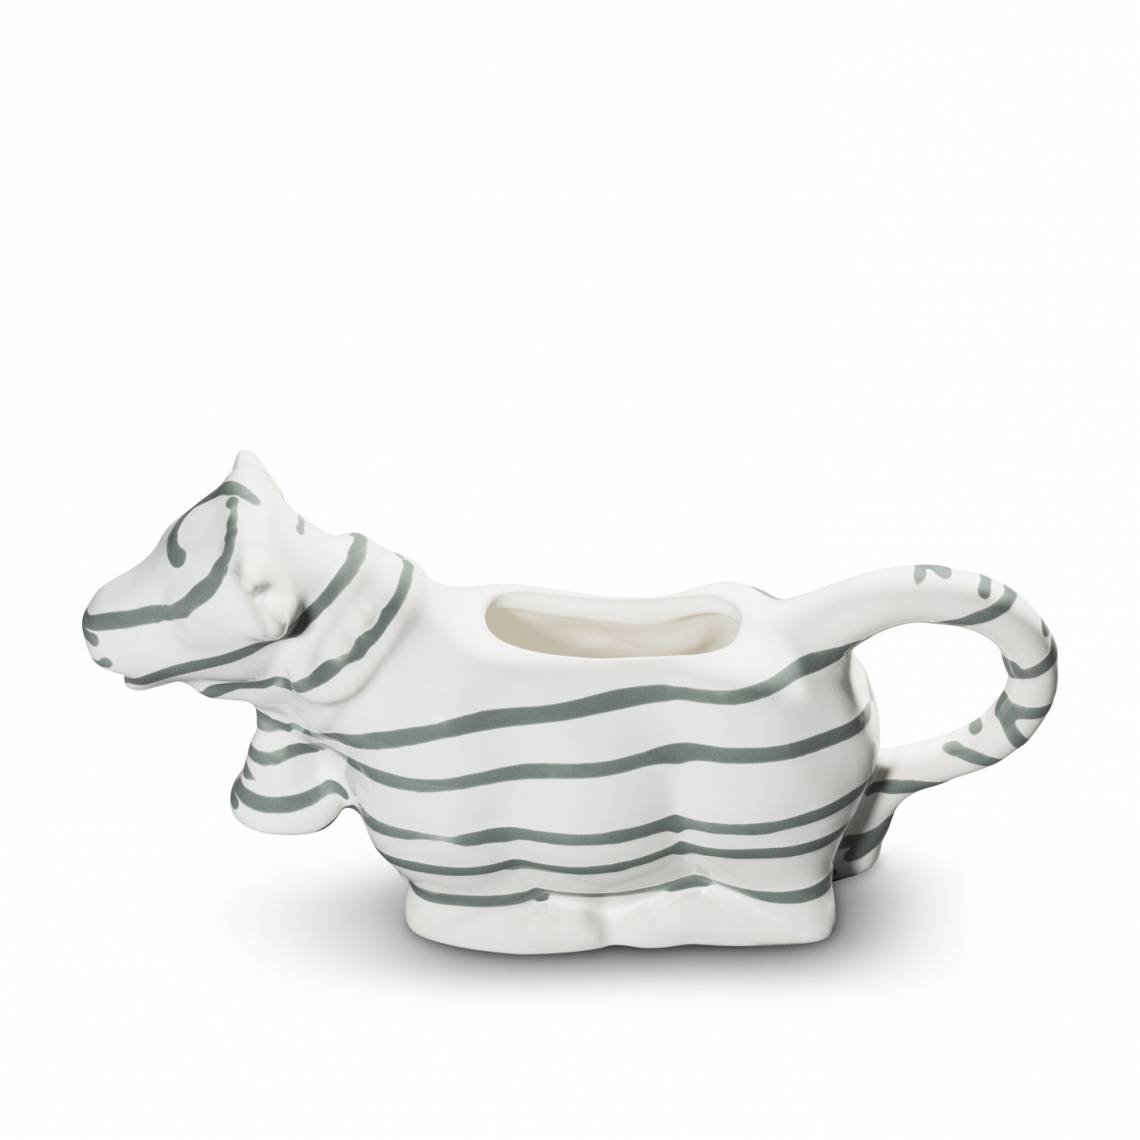 Gmundner Keramik: Graugeflammt und Pudertöne / Milchkuh /0106GIMK19